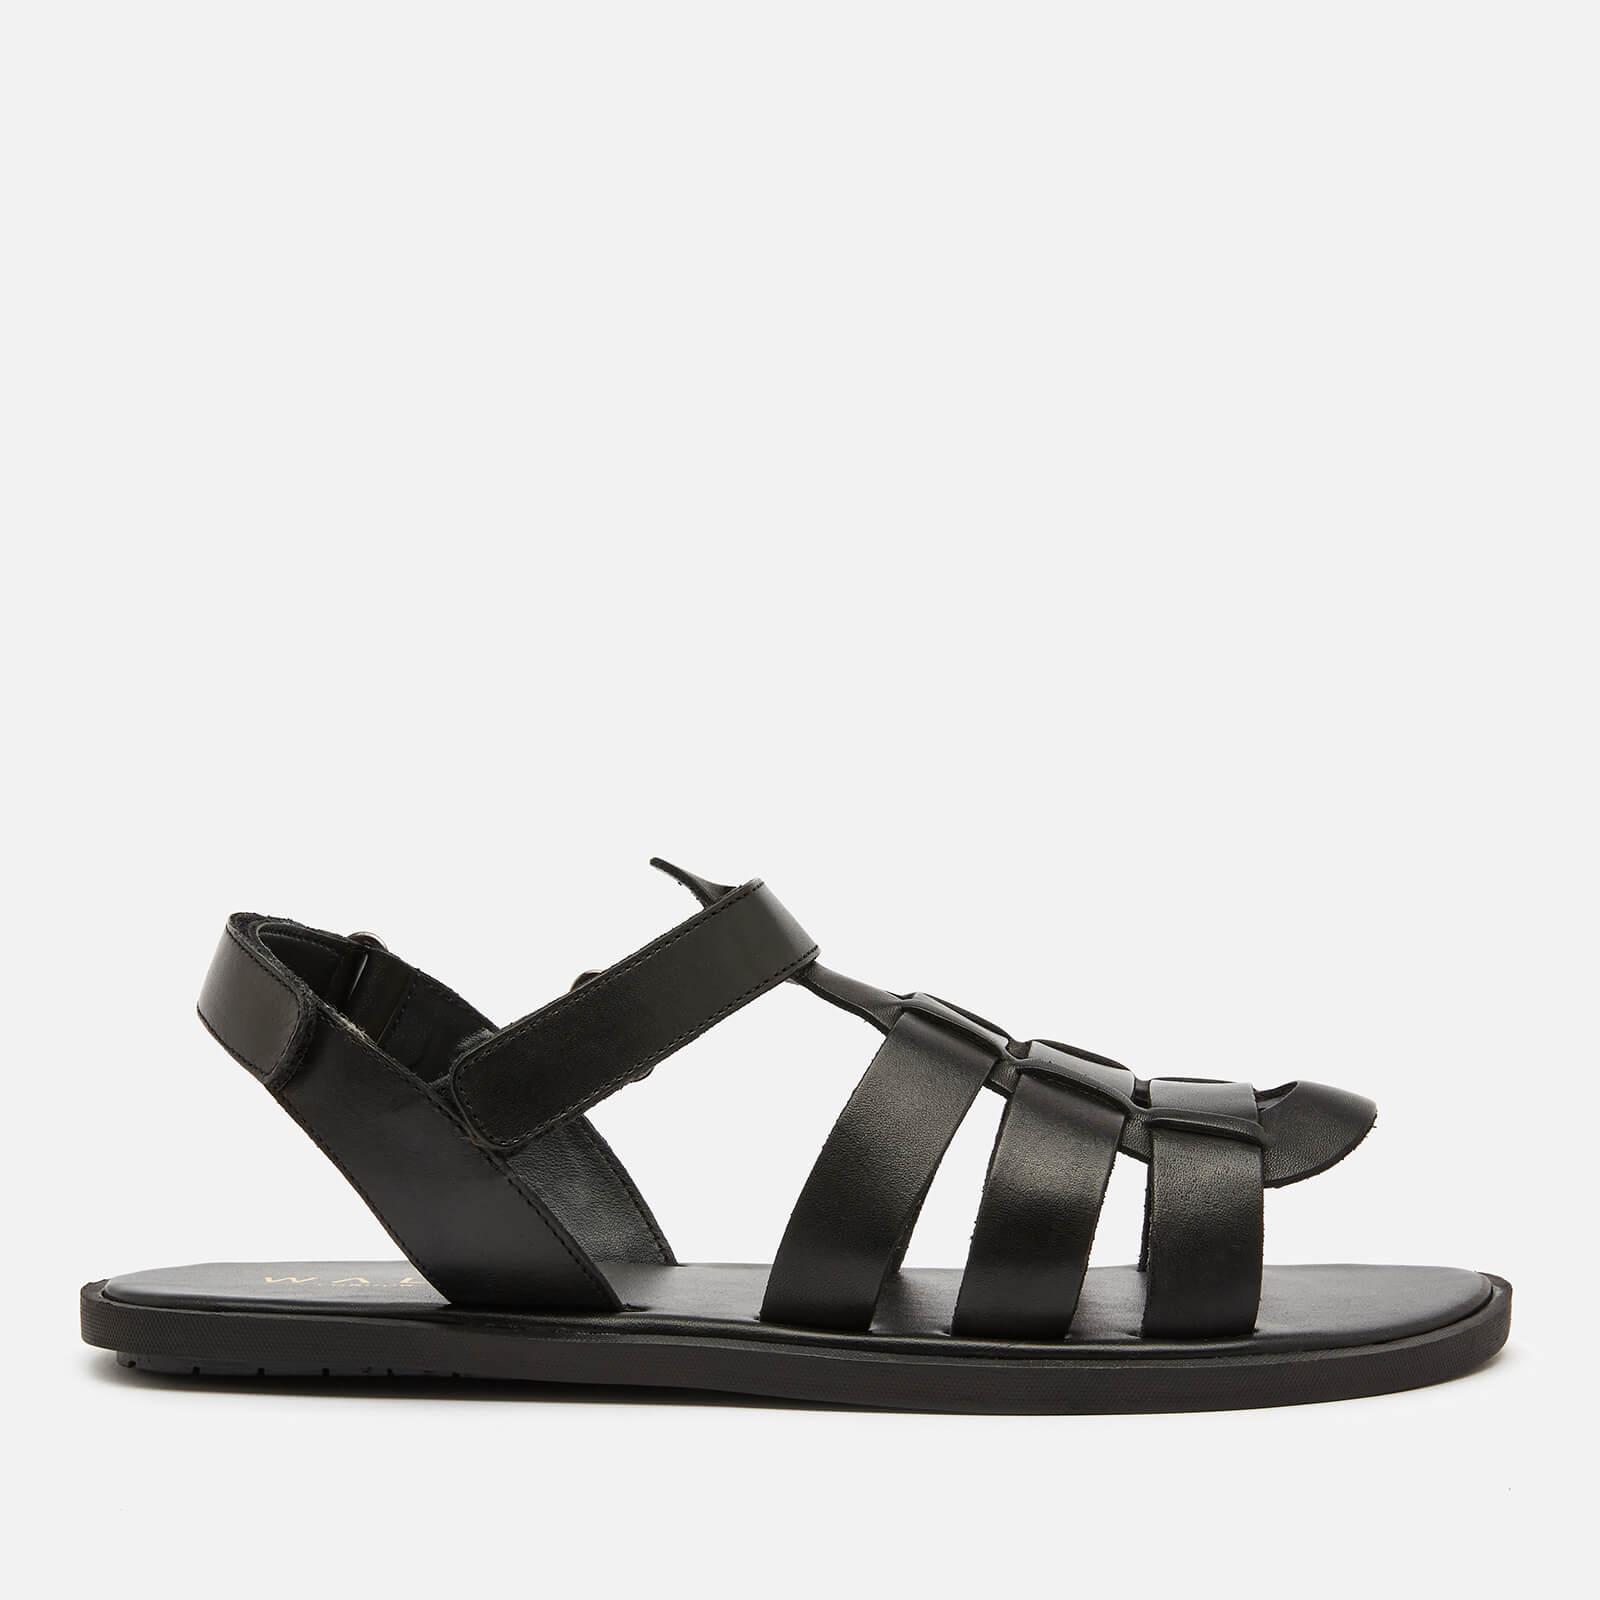 Walk London Men's Leather Gladiator Sandals - Black - UK 11